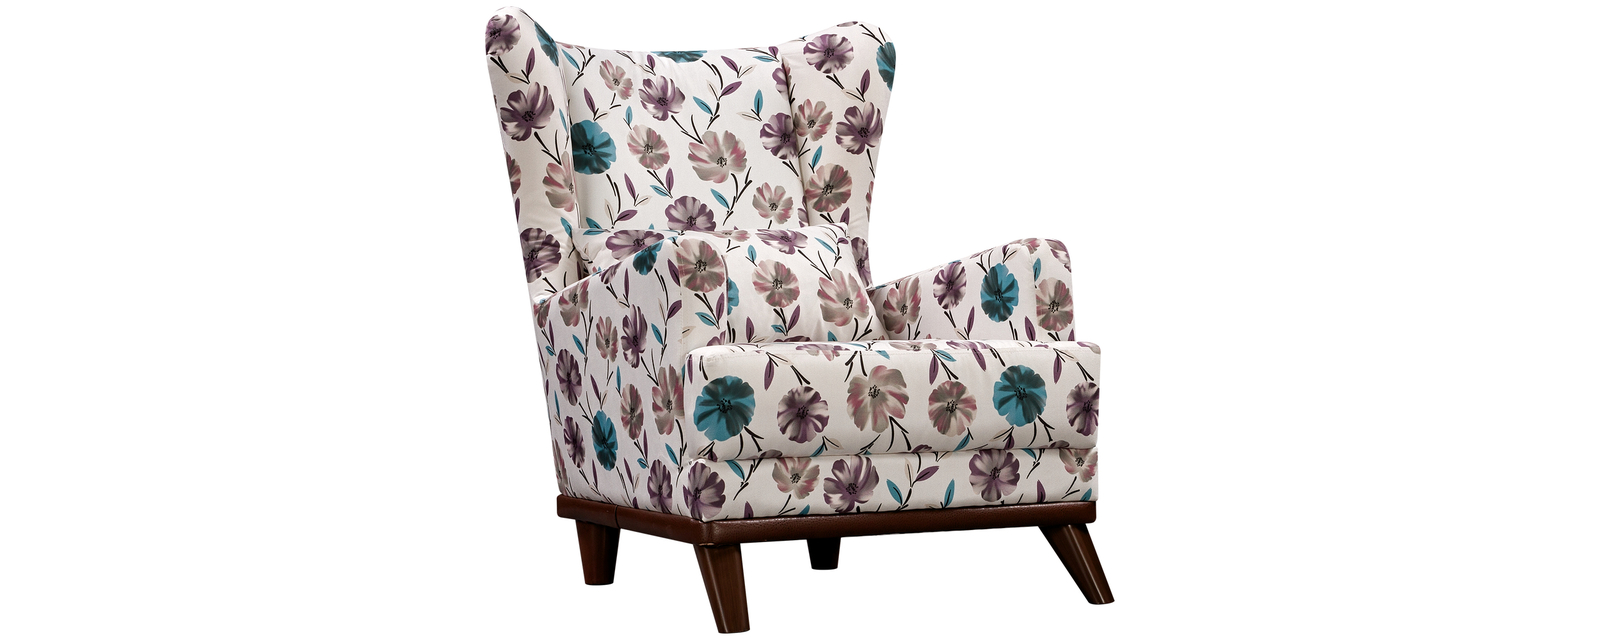 Кресло тканевое Оскар Flowers бежевый (Ткань)